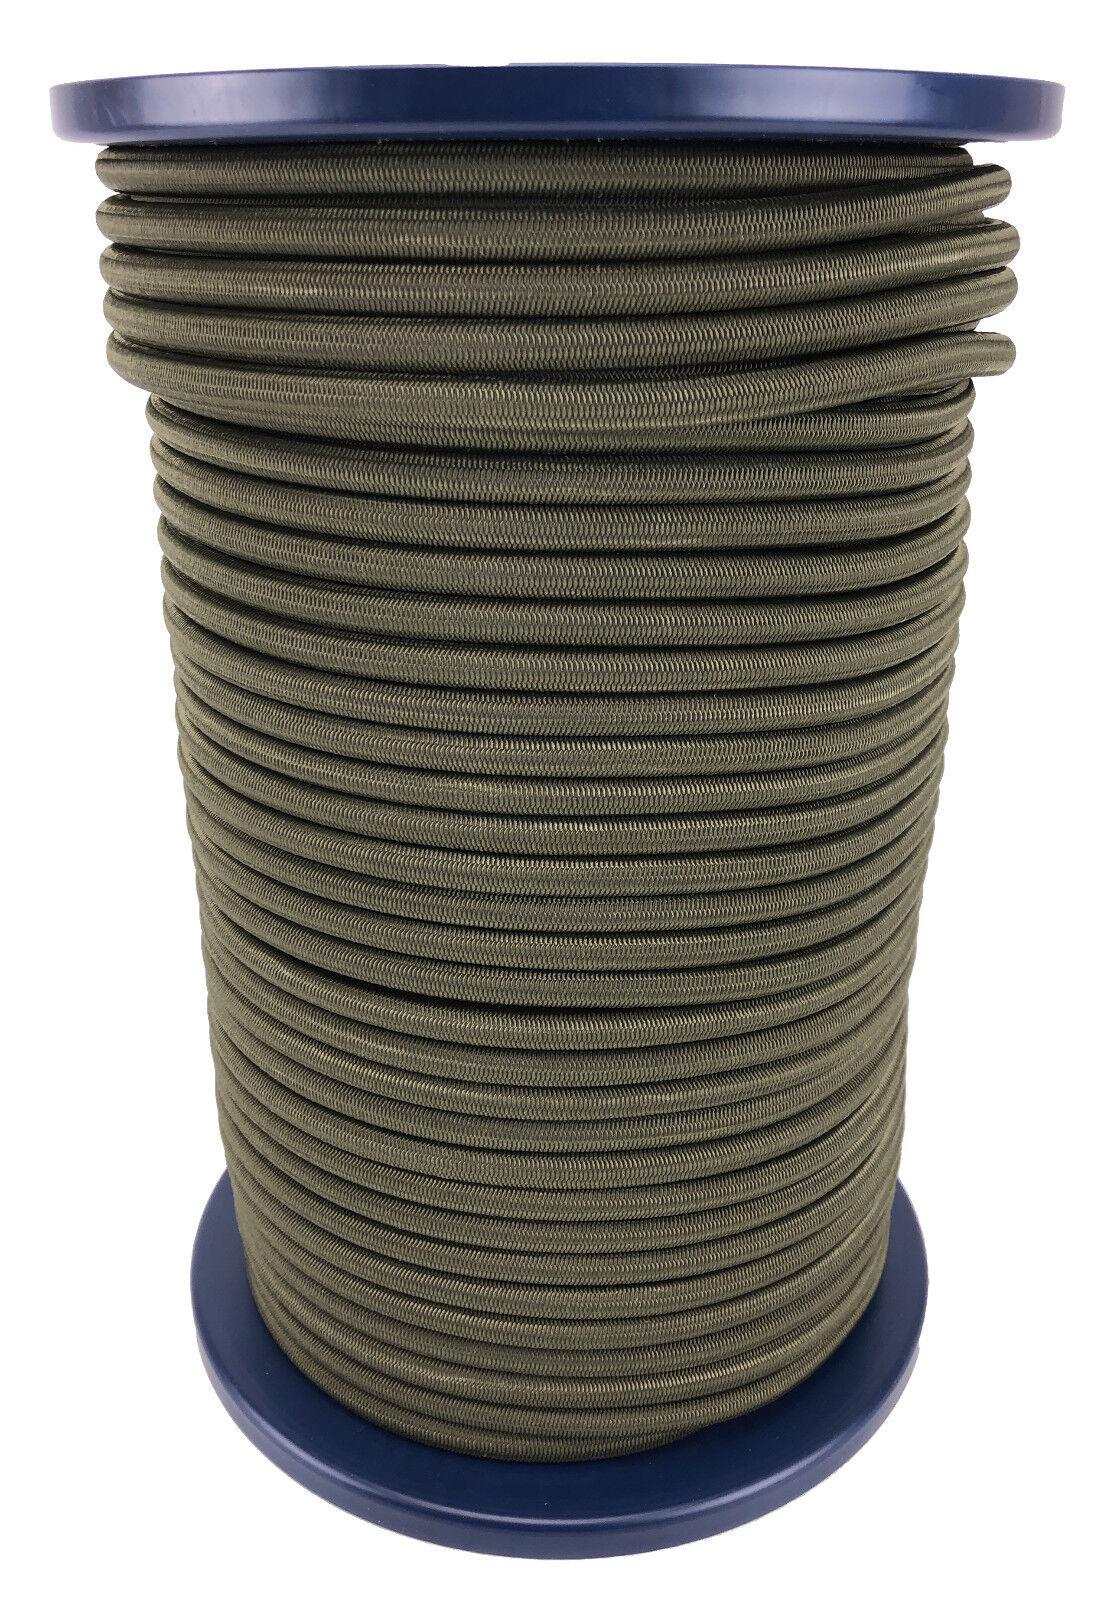 12 mm Olive farblos elastisches Gummi seil. Gummiseil festbinden x 30 metres